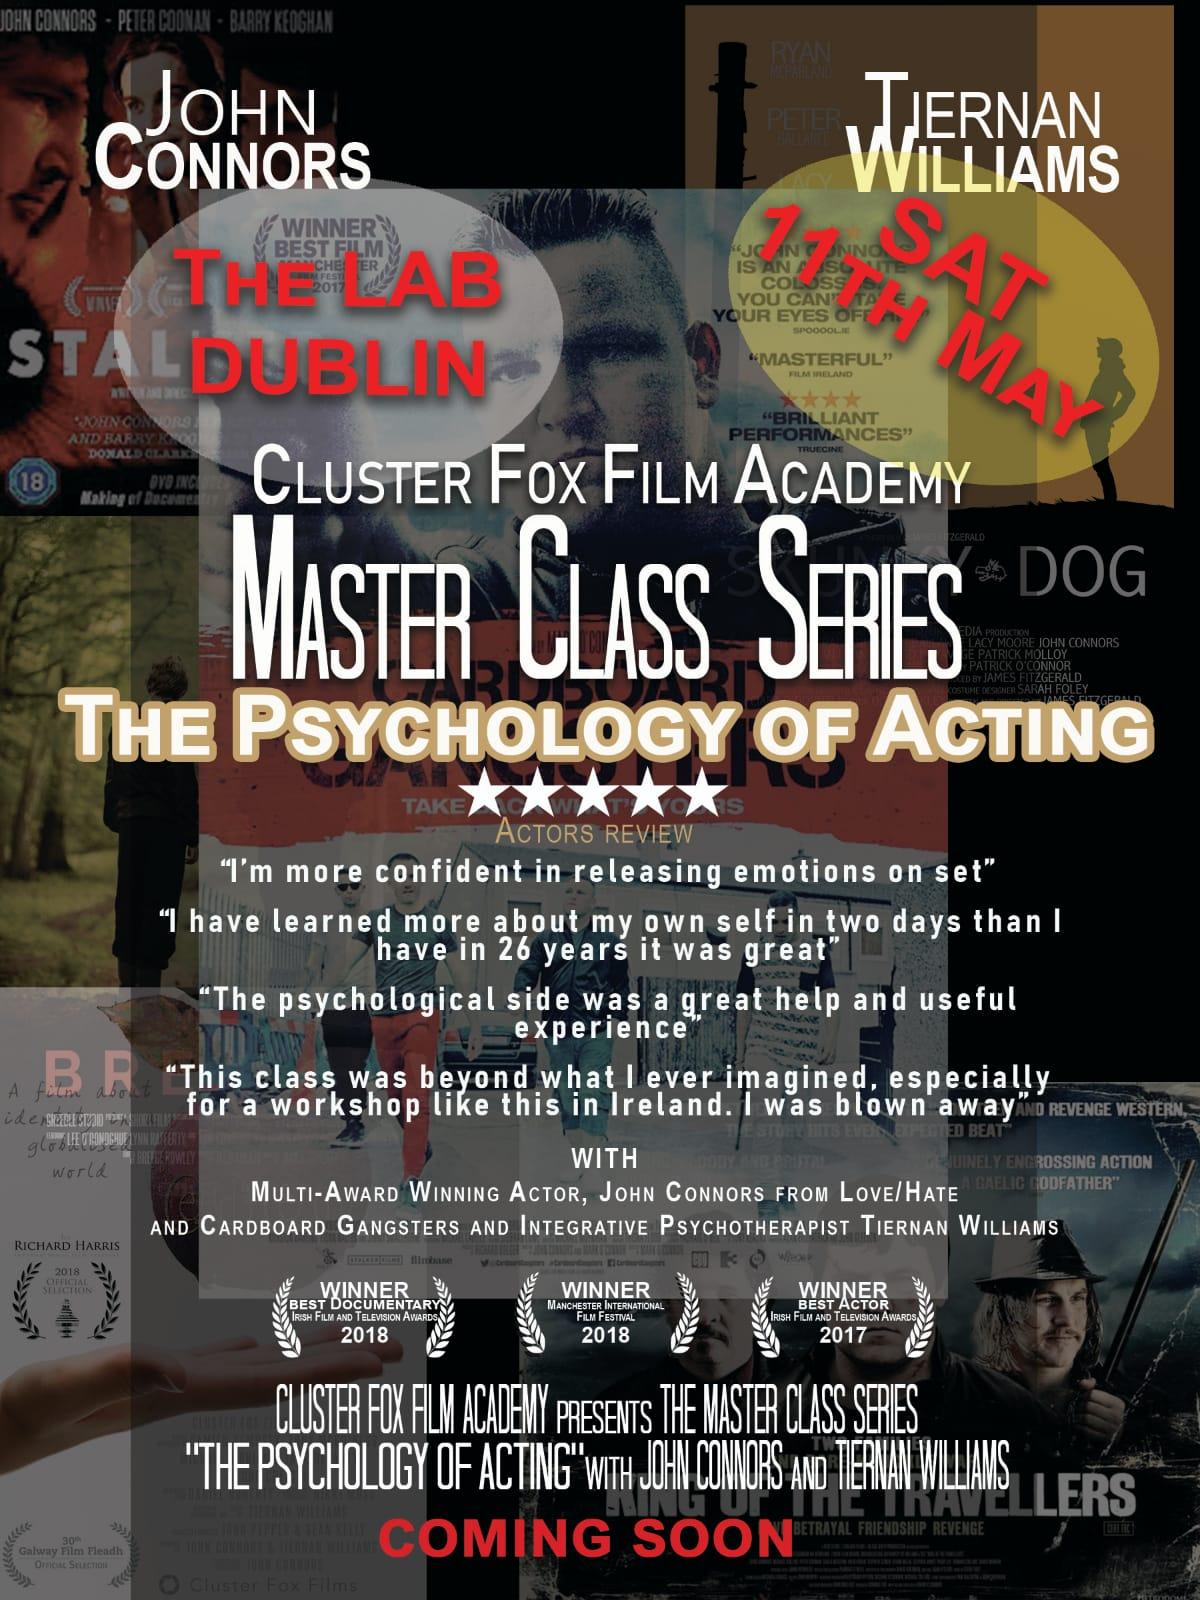 John Connors Master Class